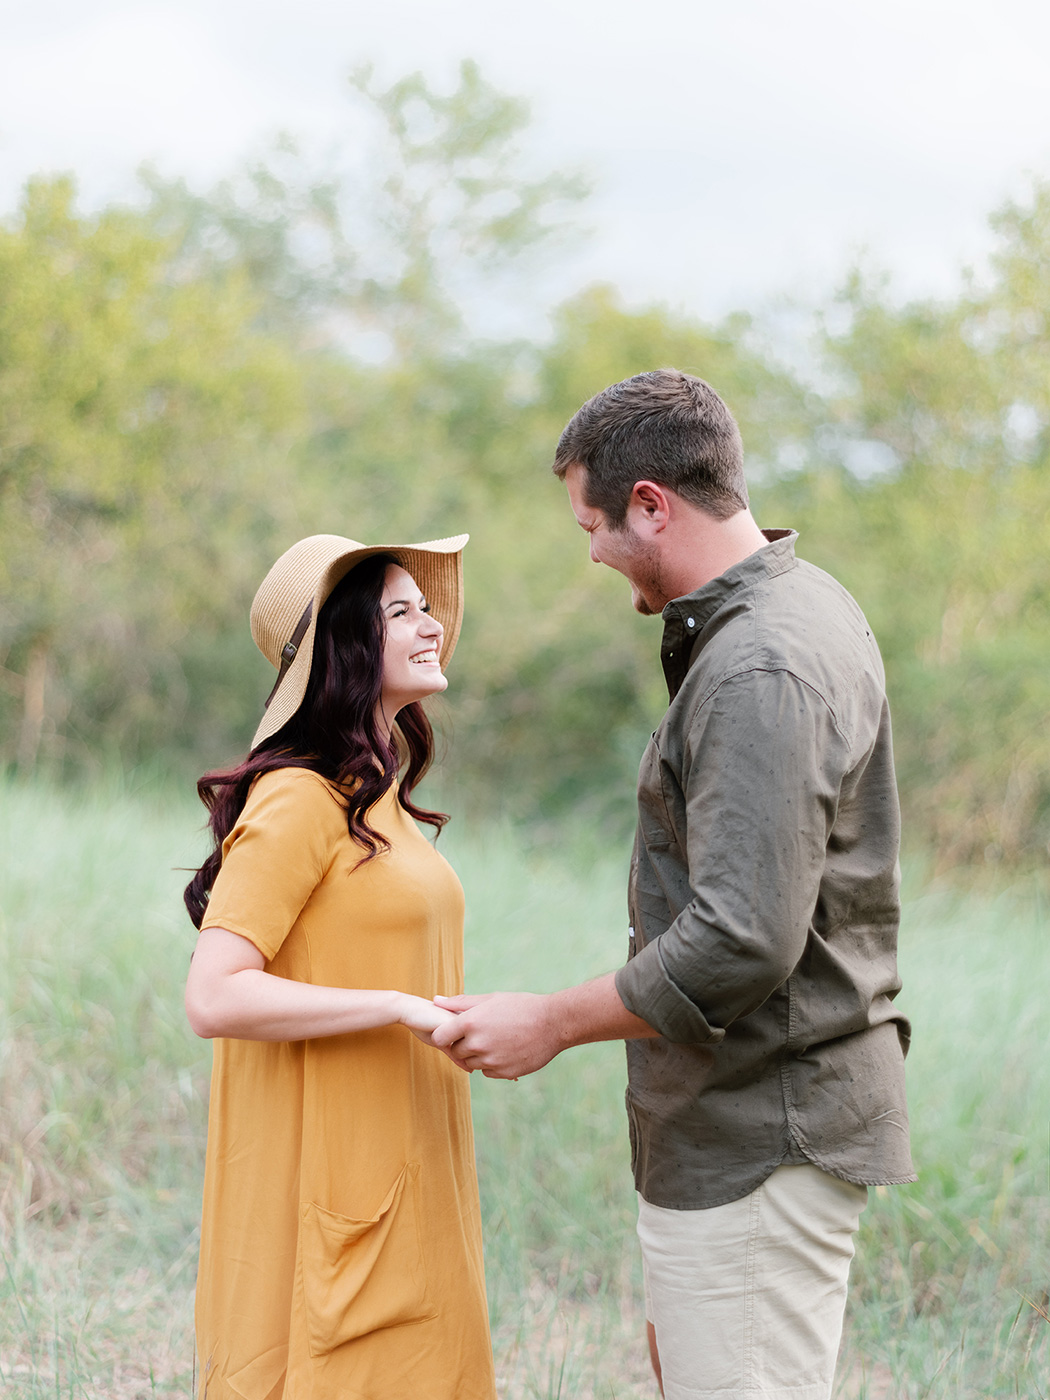 Bushveld Couple Shoot | Rensche Mari